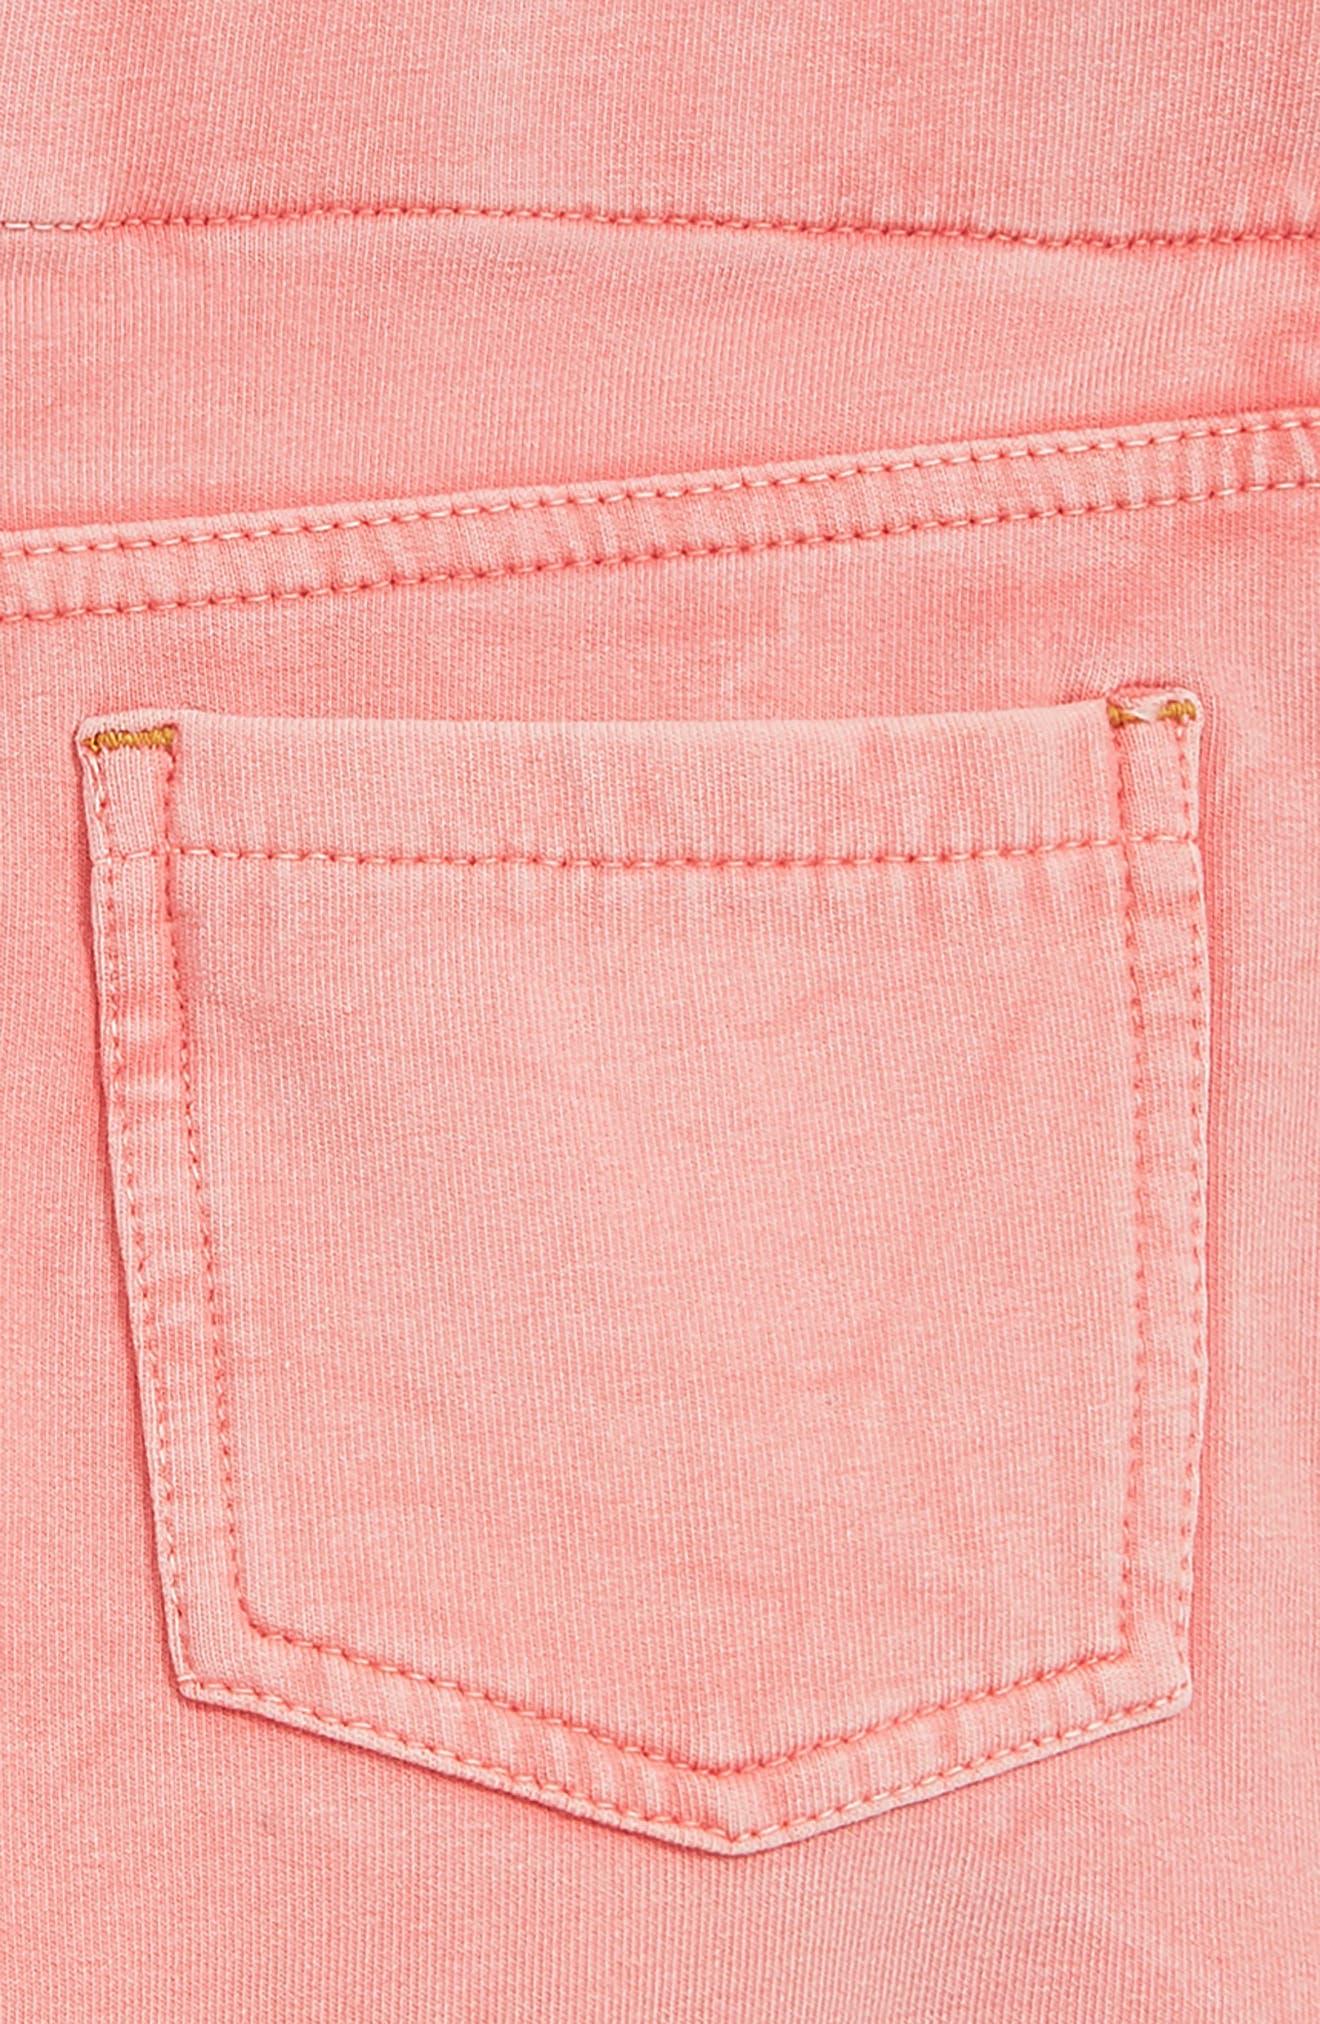 'Jenna' Jegging Shorts,                             Alternate thumbnail 3, color,                             Coral Shell Wash